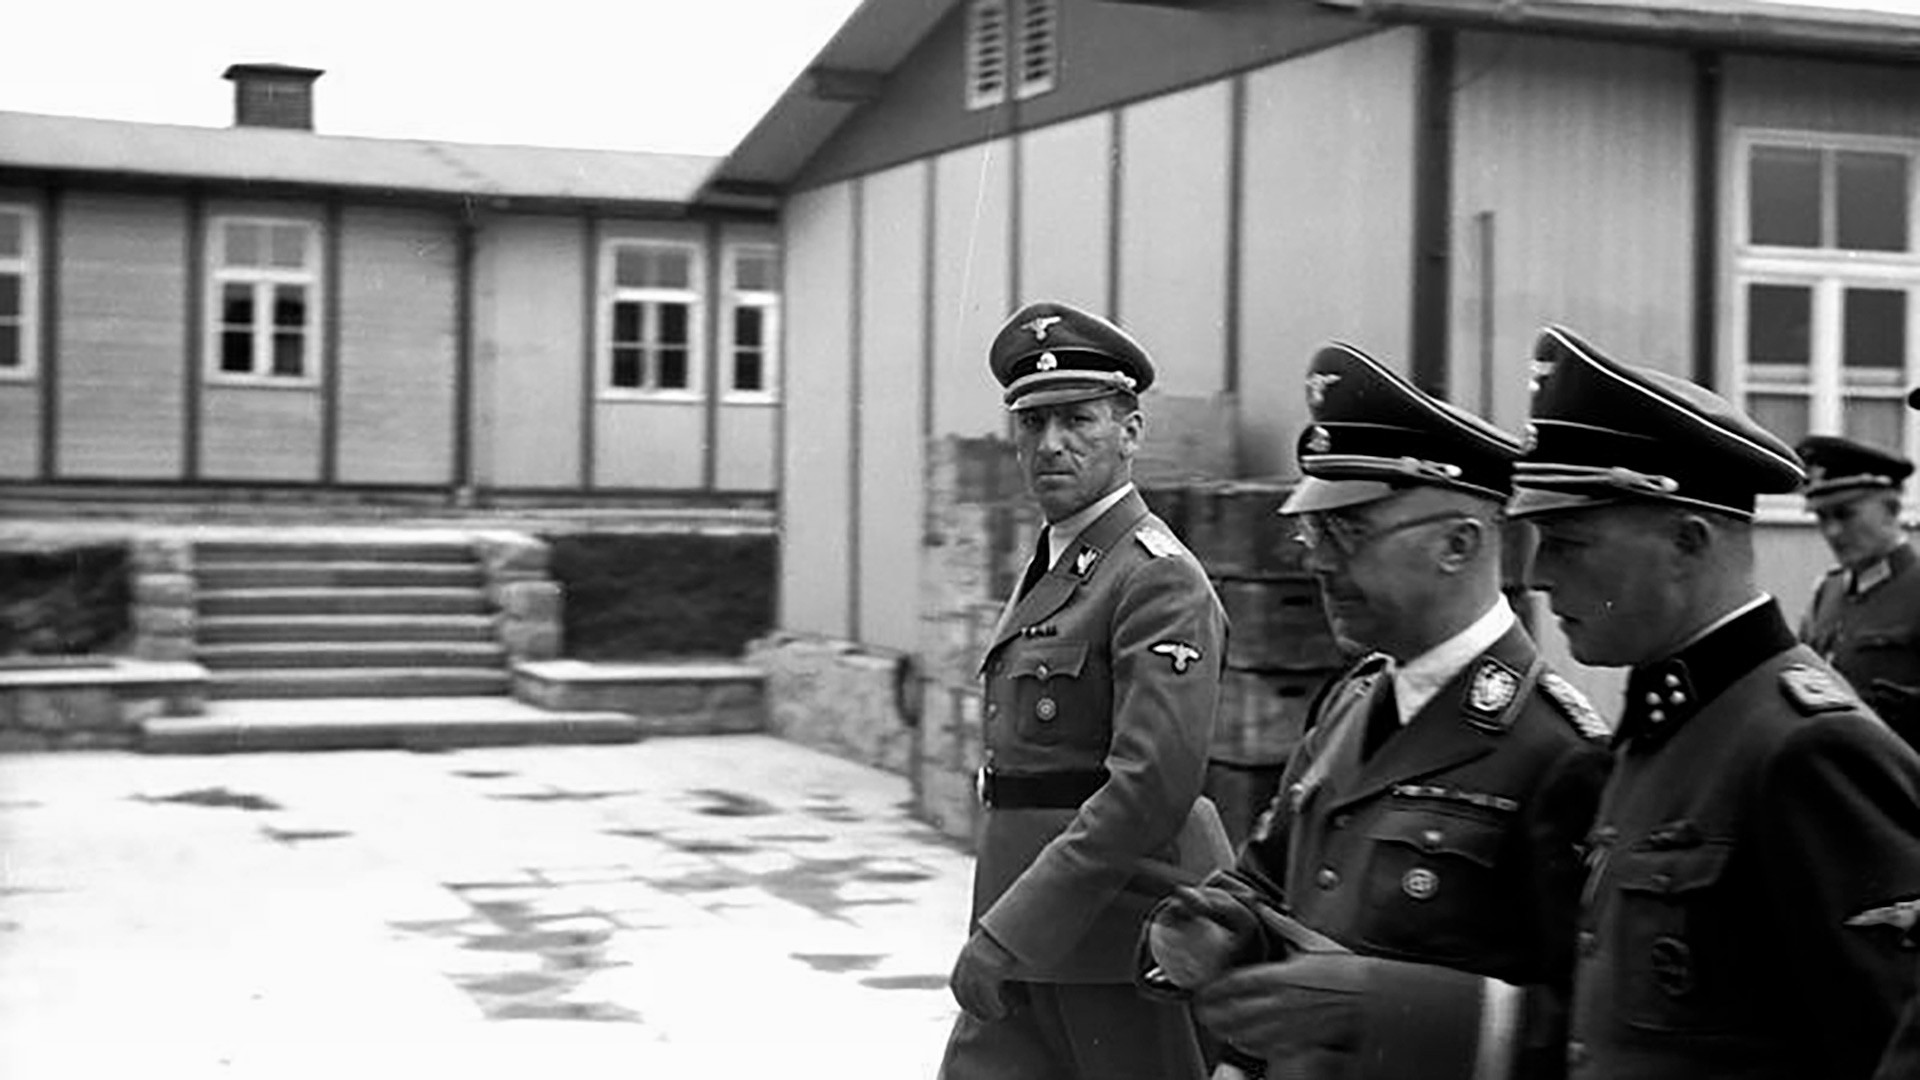 Концентрациони логор Маутхаузен. Химлер, Калтенбрунер и Цирајс.